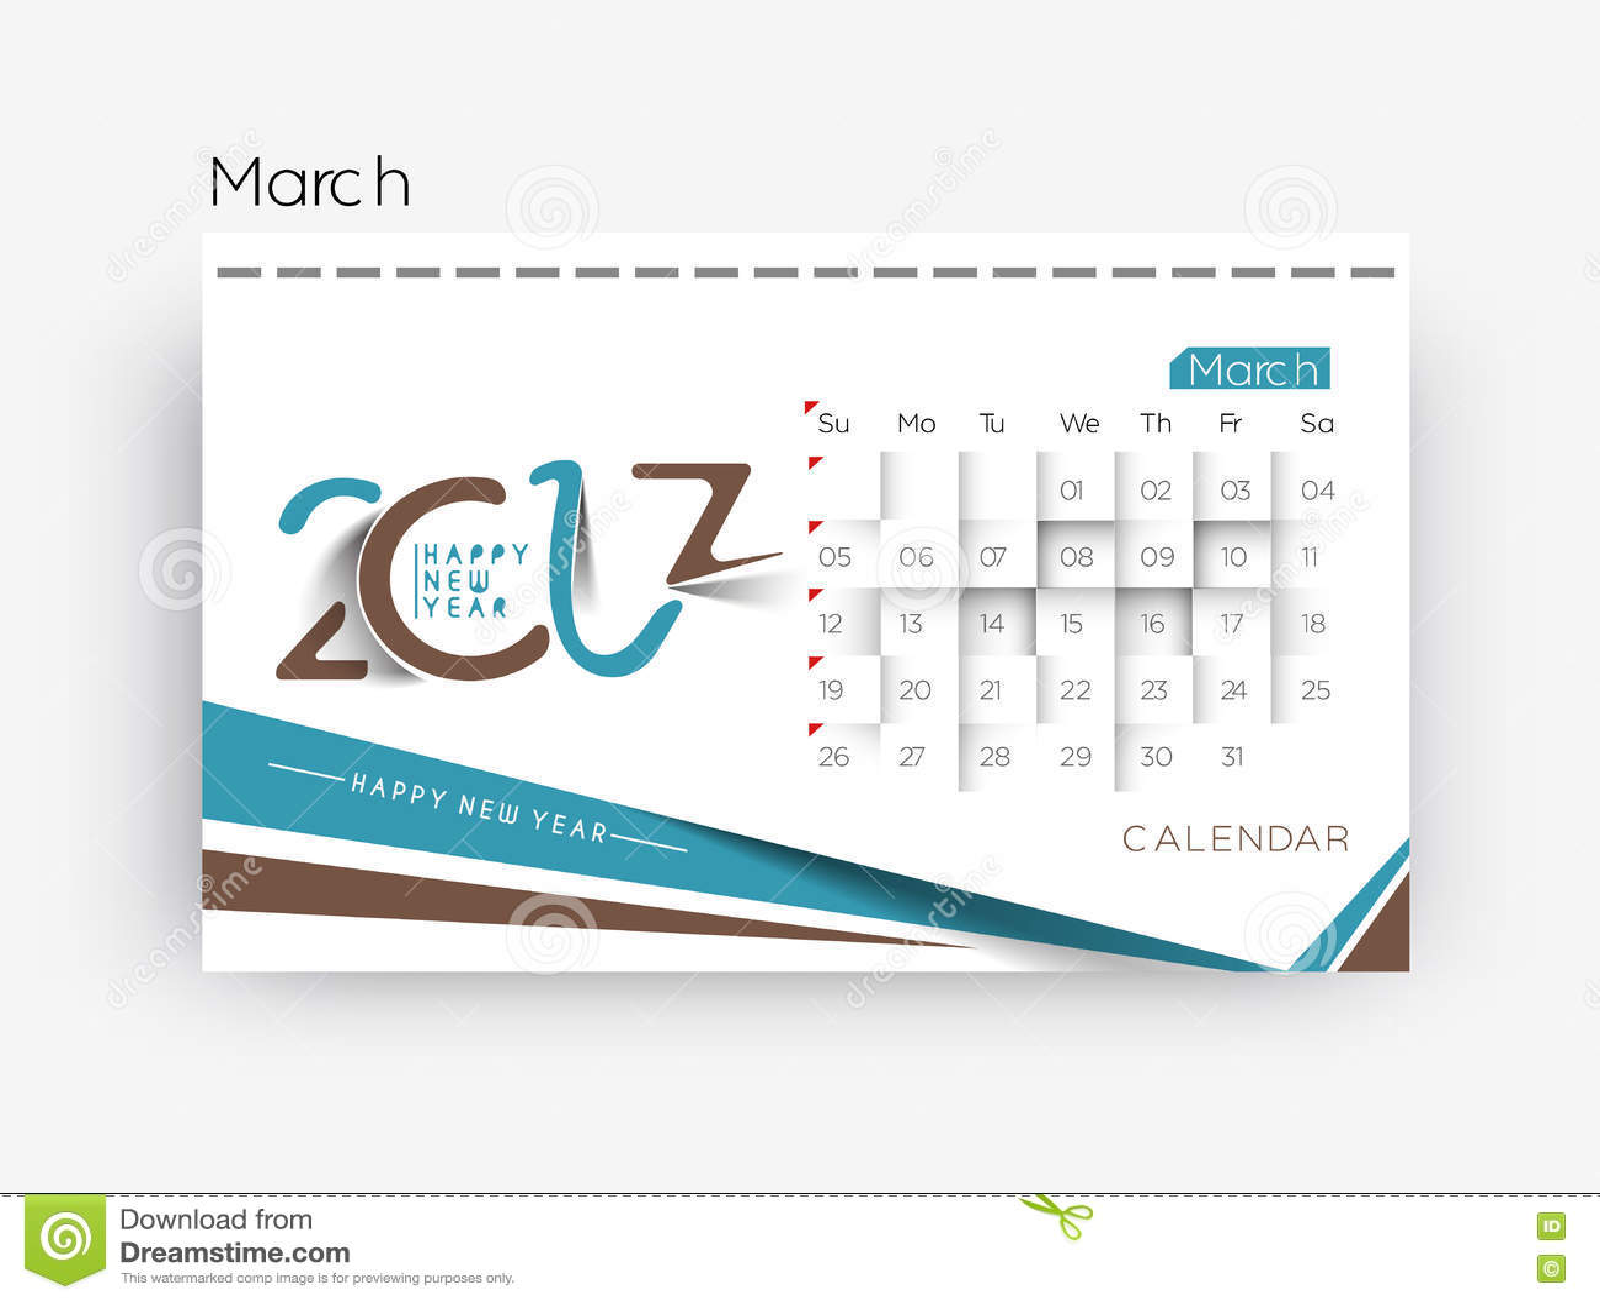 Calendar Design For New Year : Happy new year calendar design elements stock vector